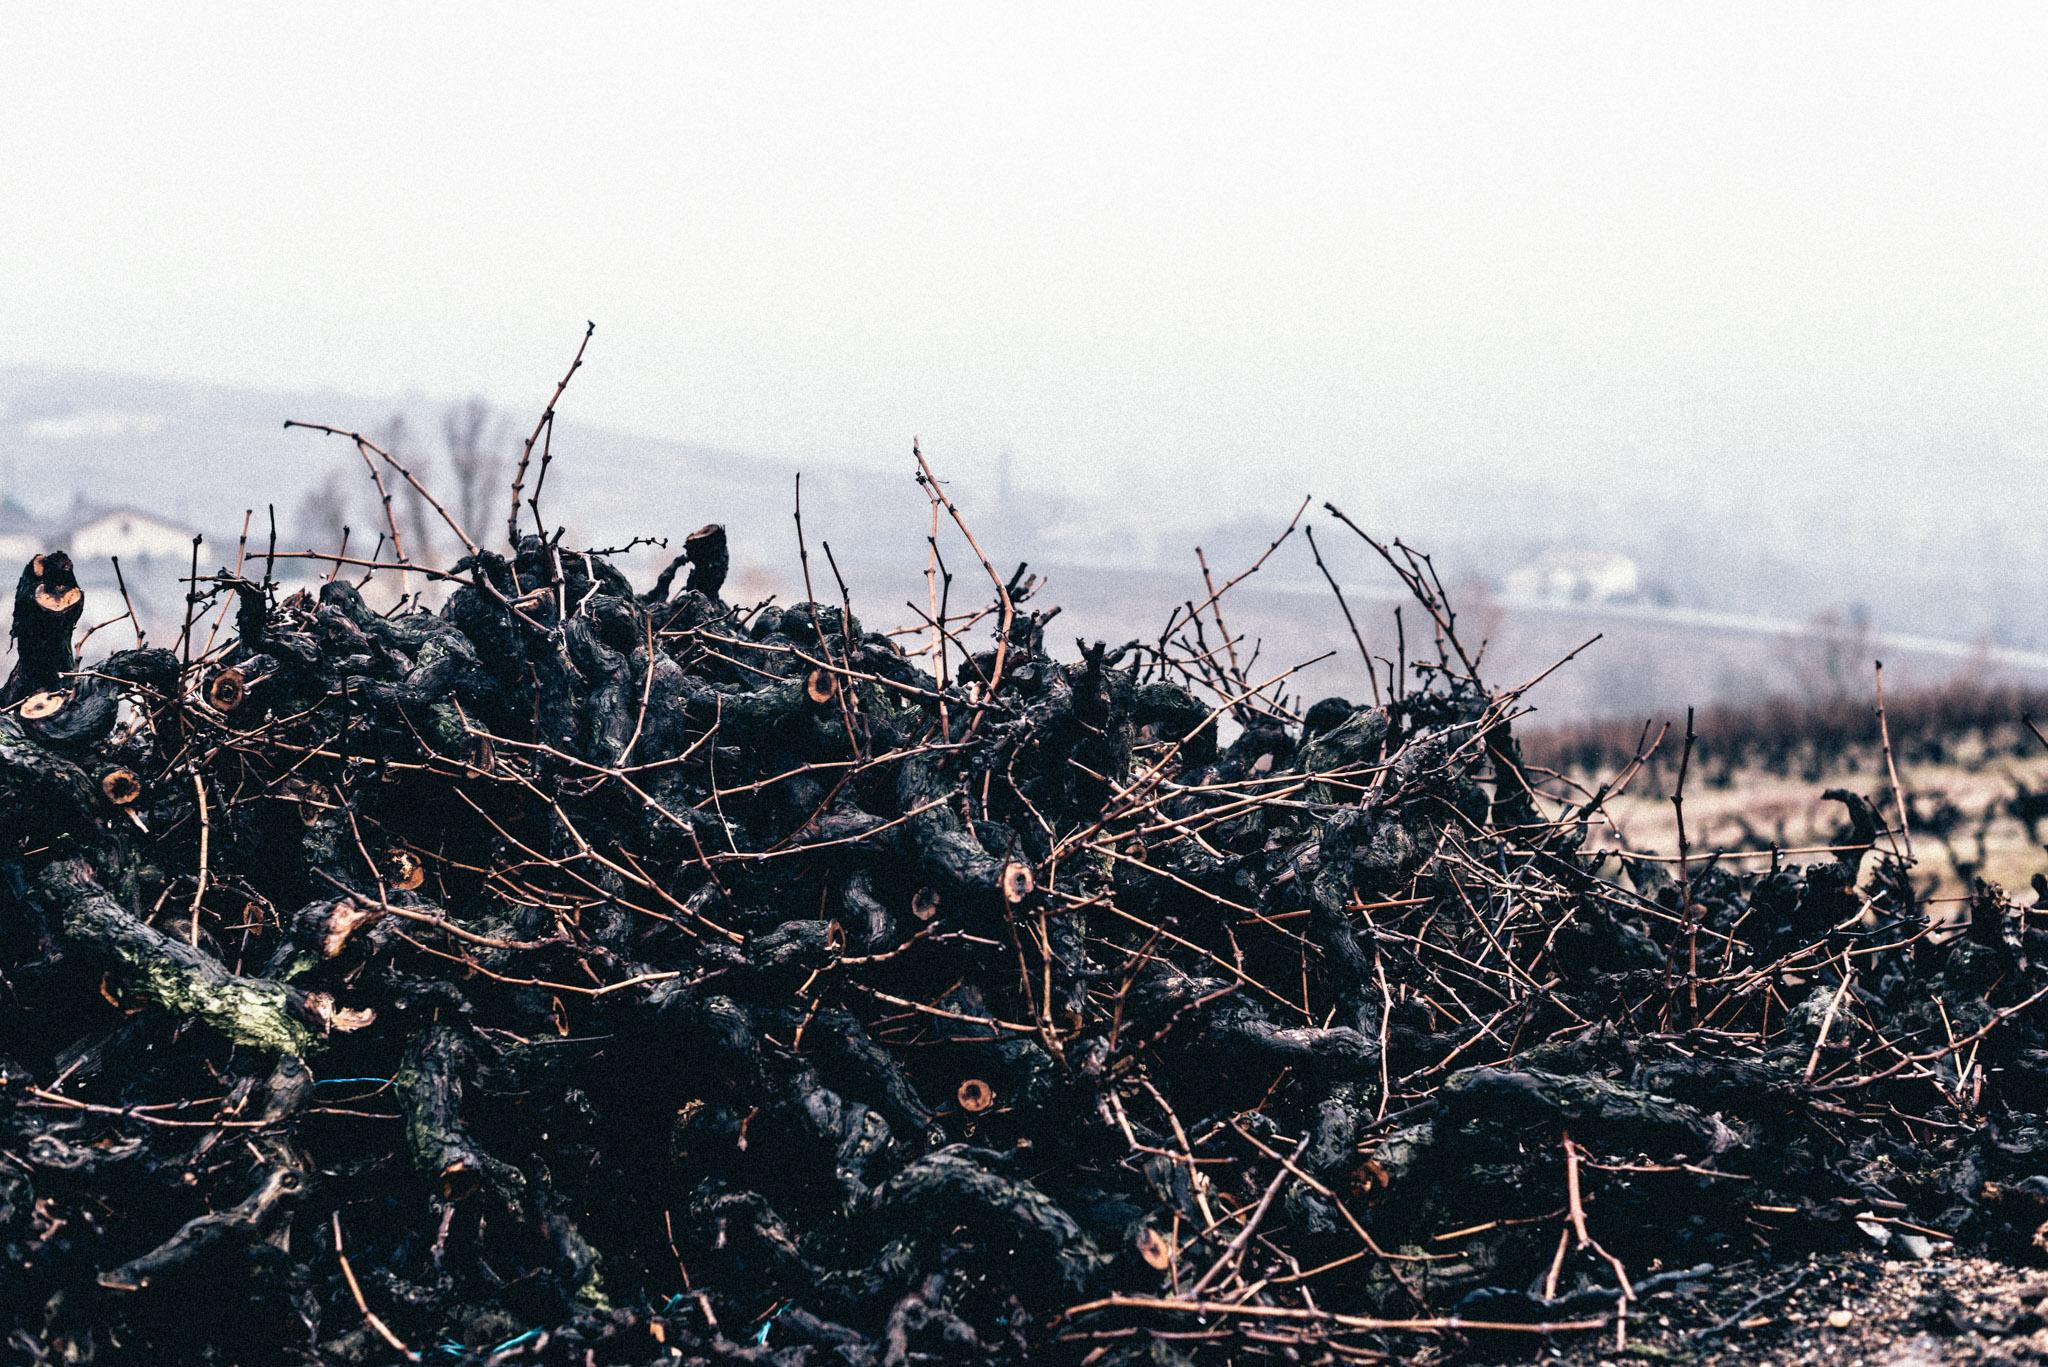 France : Beaujolais : Vine cuttings